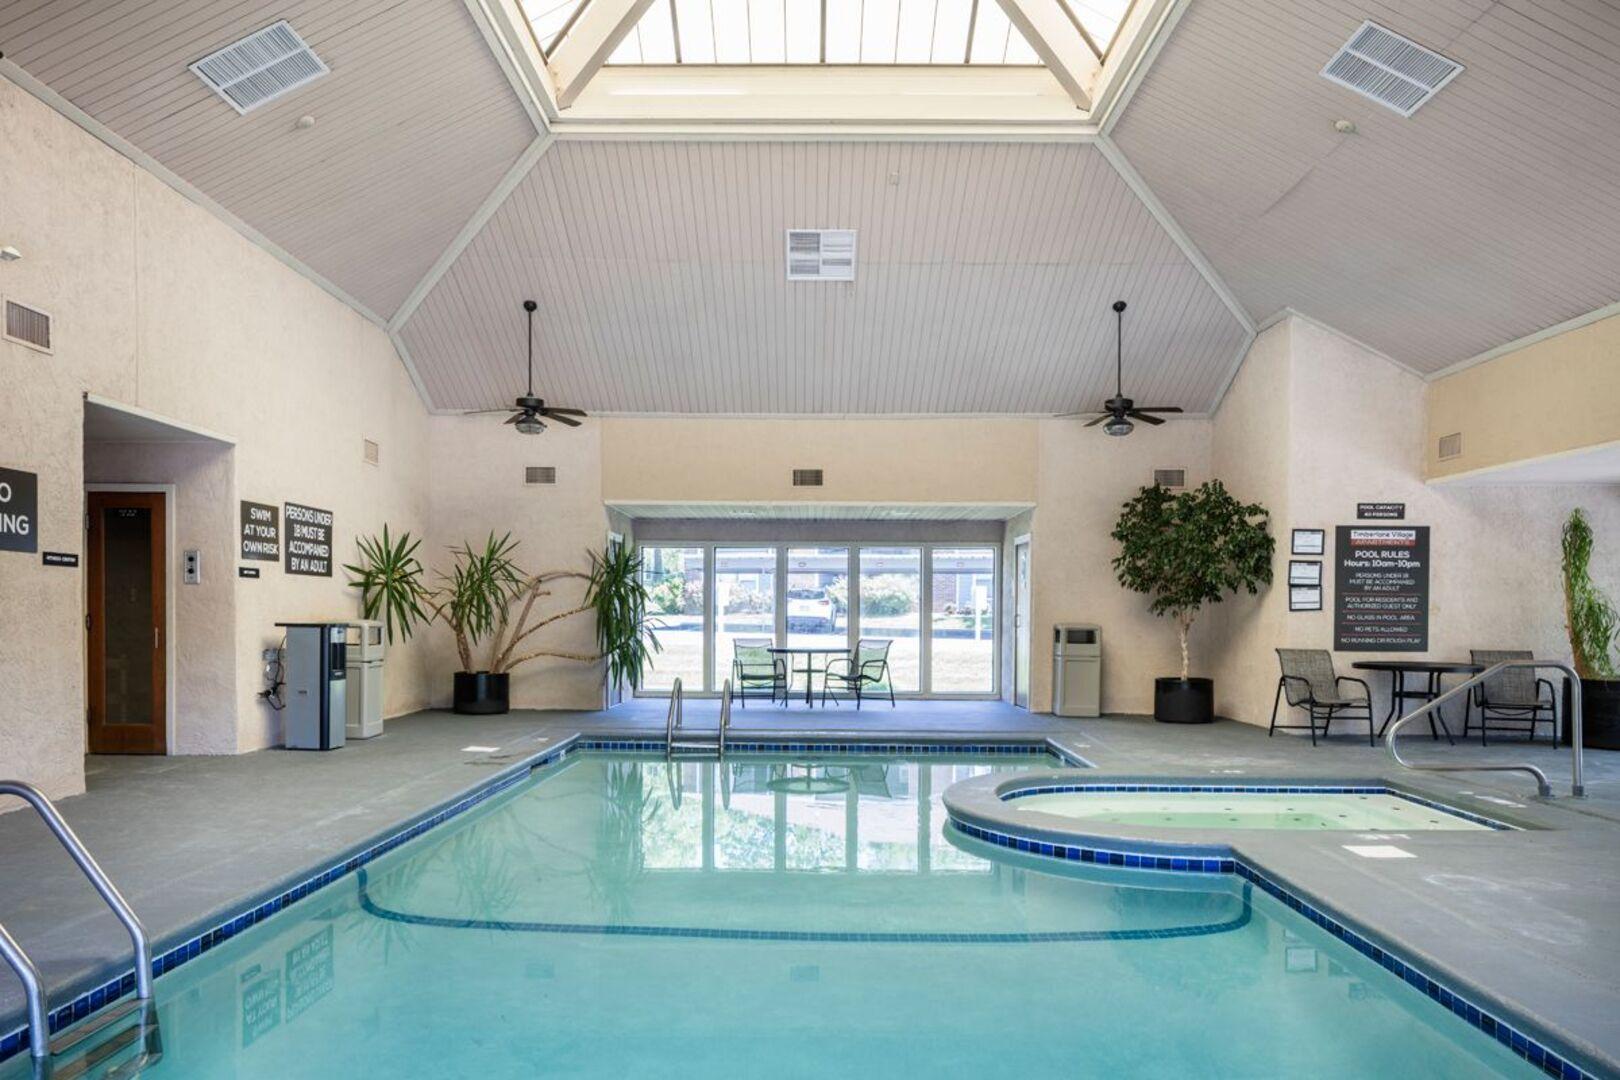 Apartments for Rent Kansas City MO | Timberlane Village Apartments